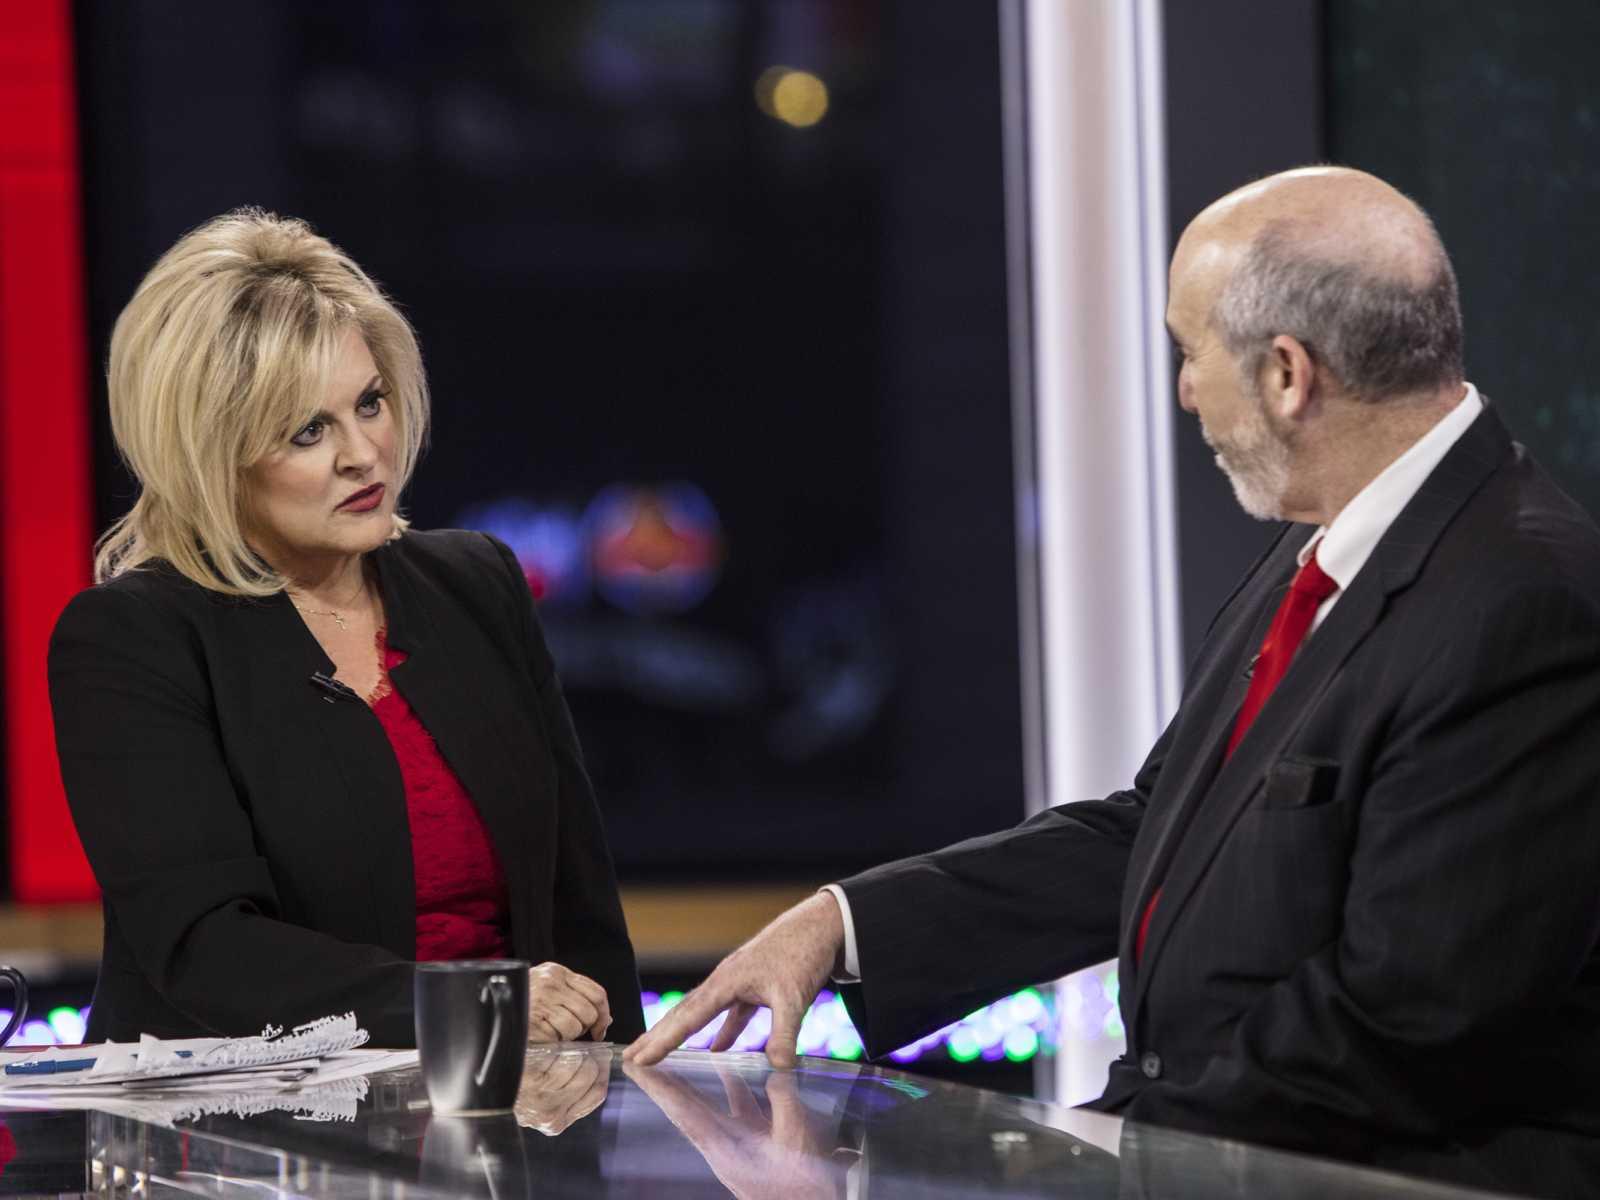 oel Brodsky and Nancy Grace